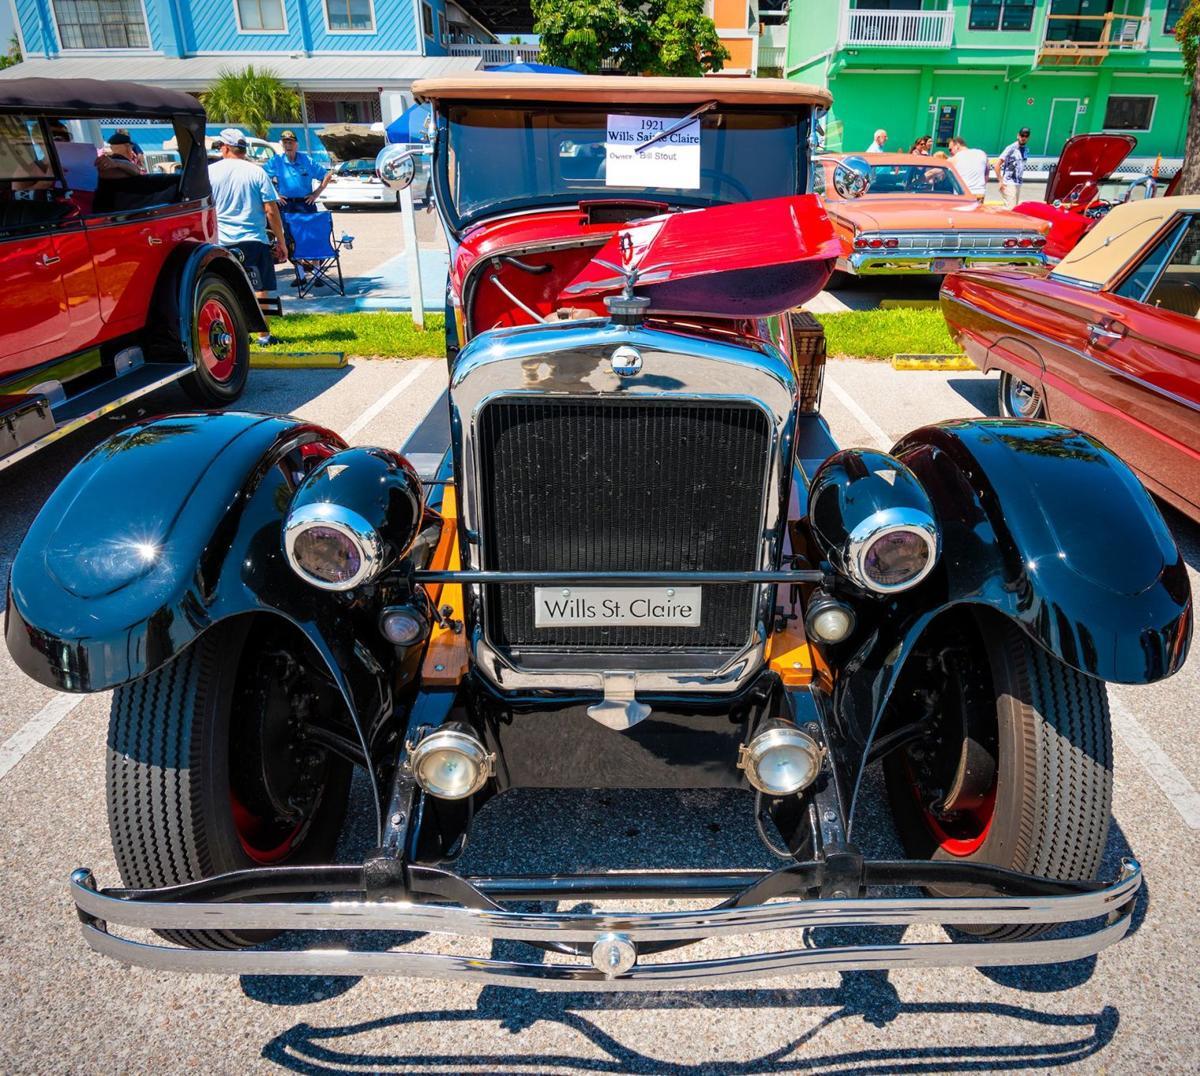 Vintage Motor Car Club showcases vehicles